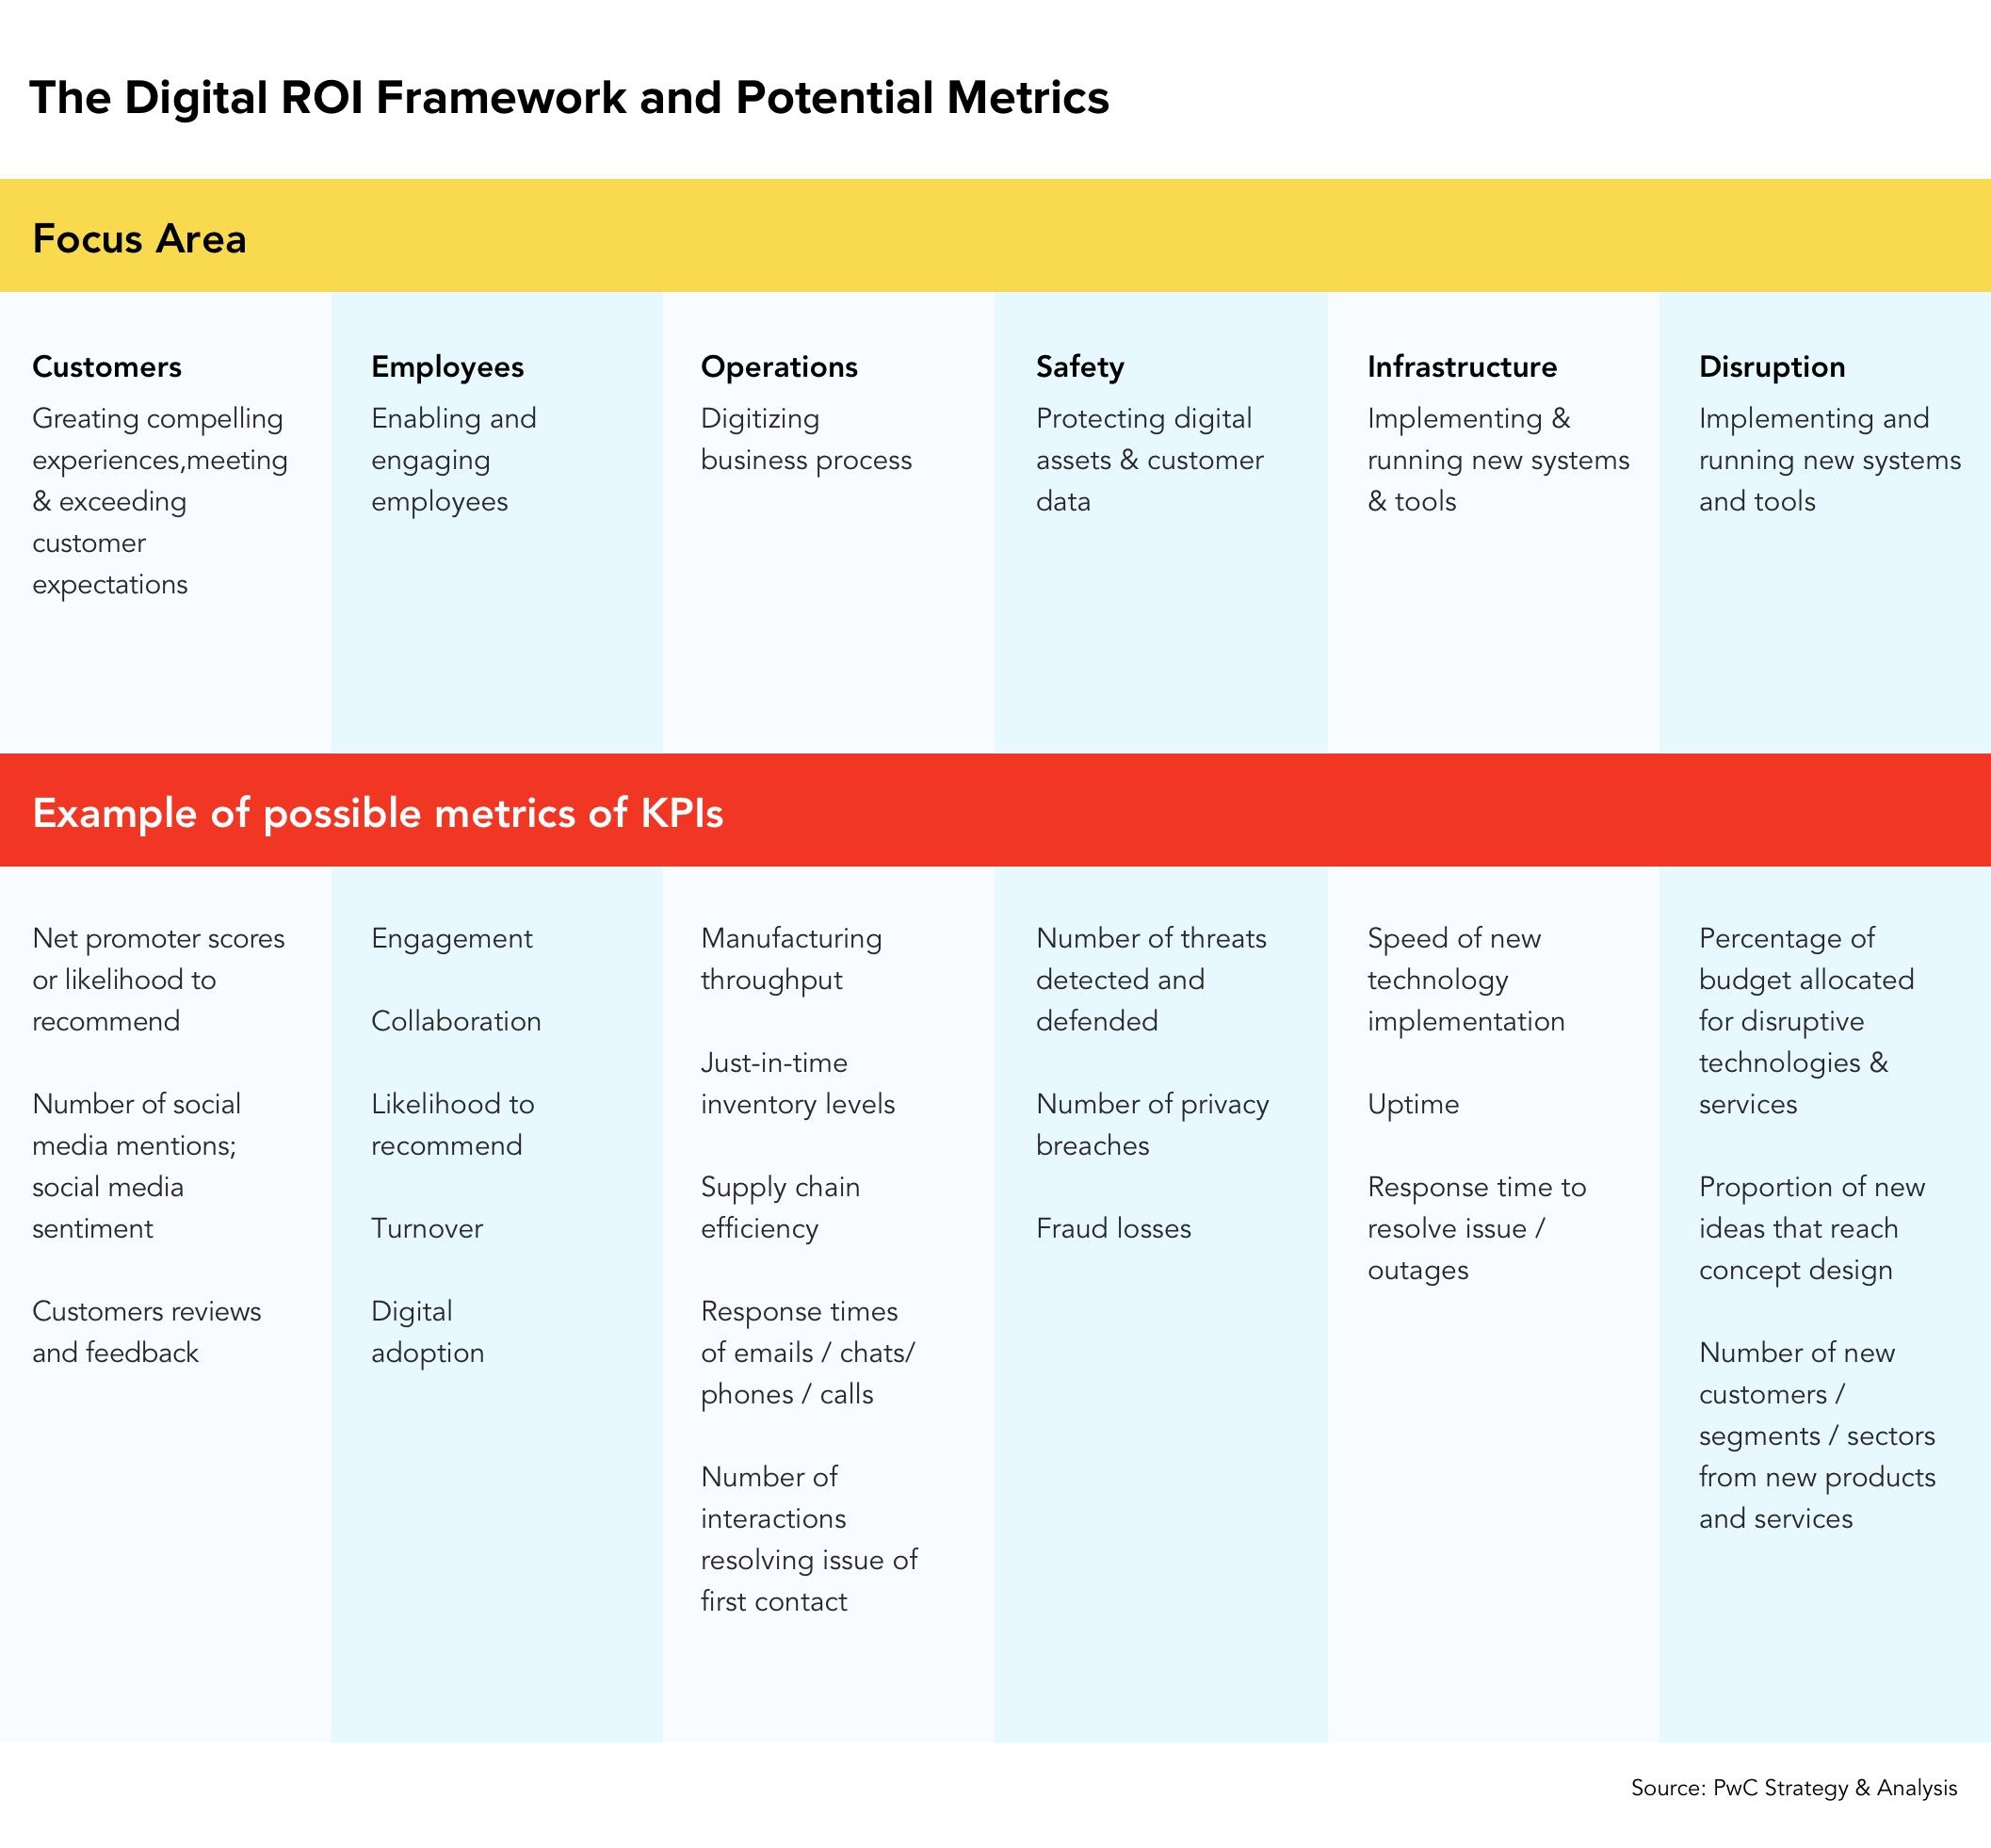 The Digital Transformation Framework and Potential Metrics